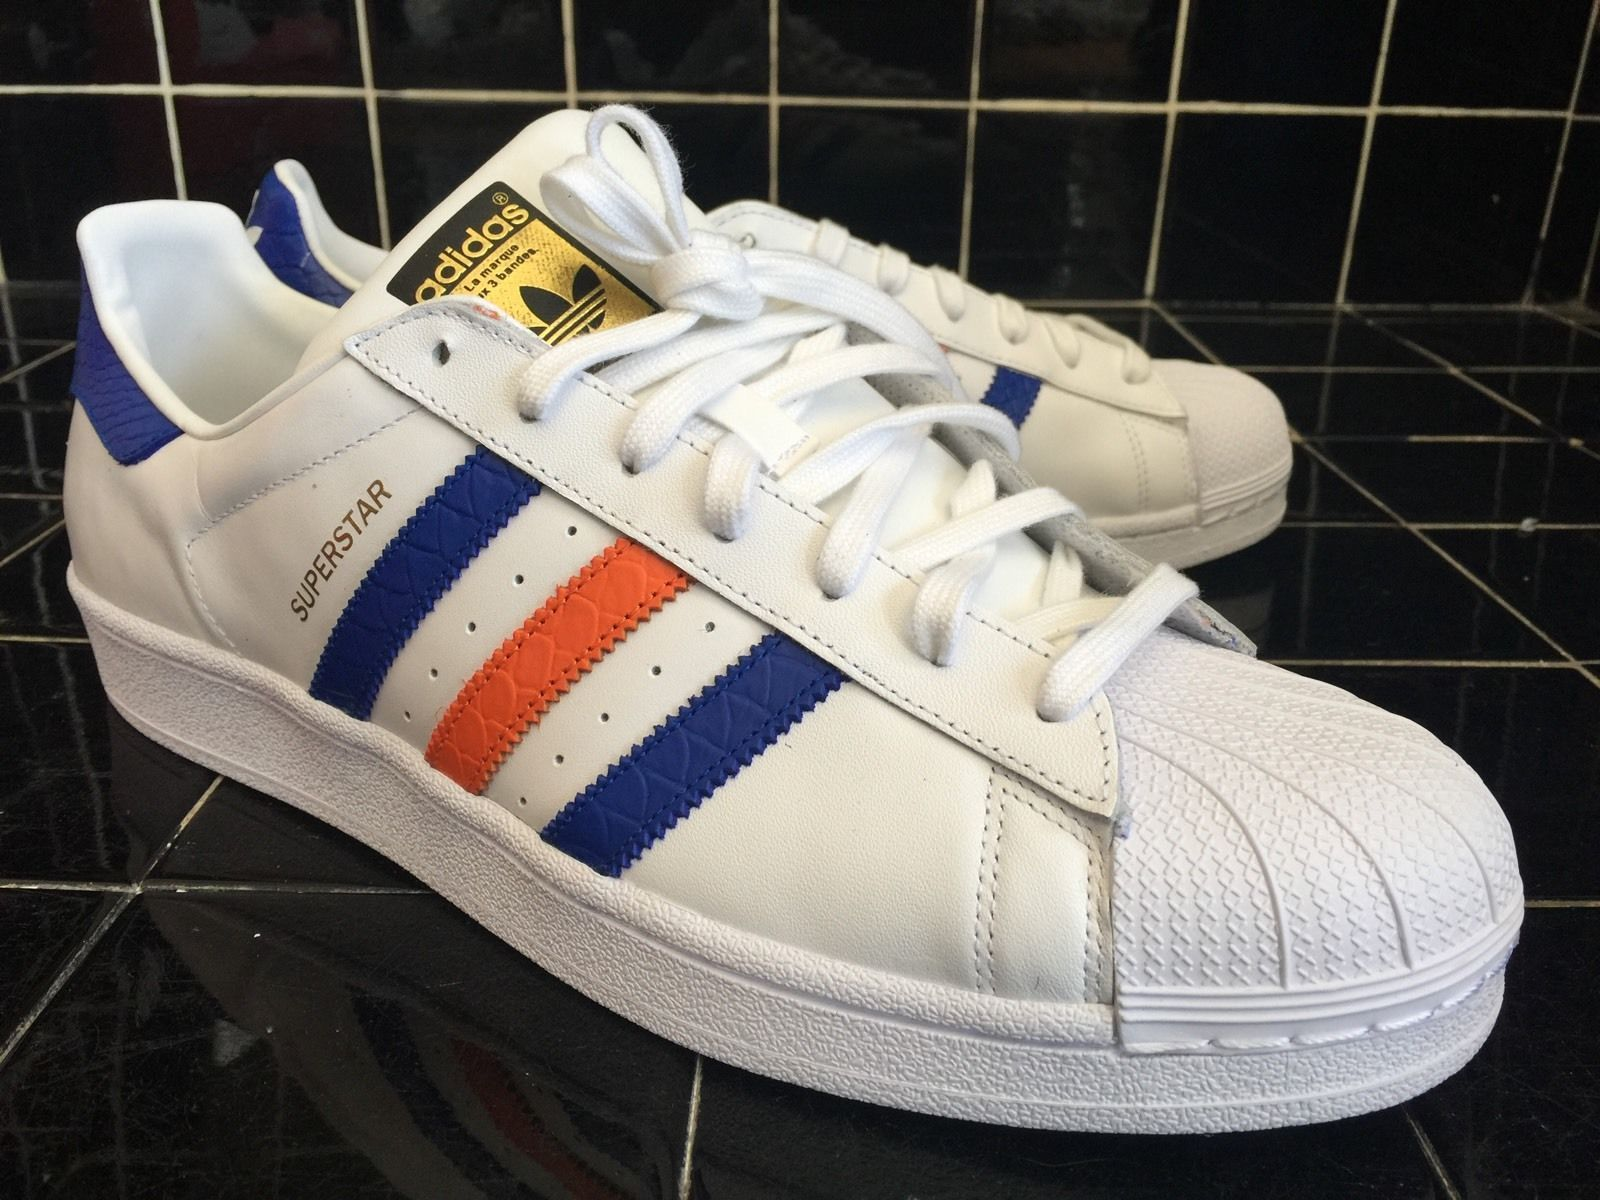 Adidas Superstar East River Rivale Weiß, Blau, Orange B34310